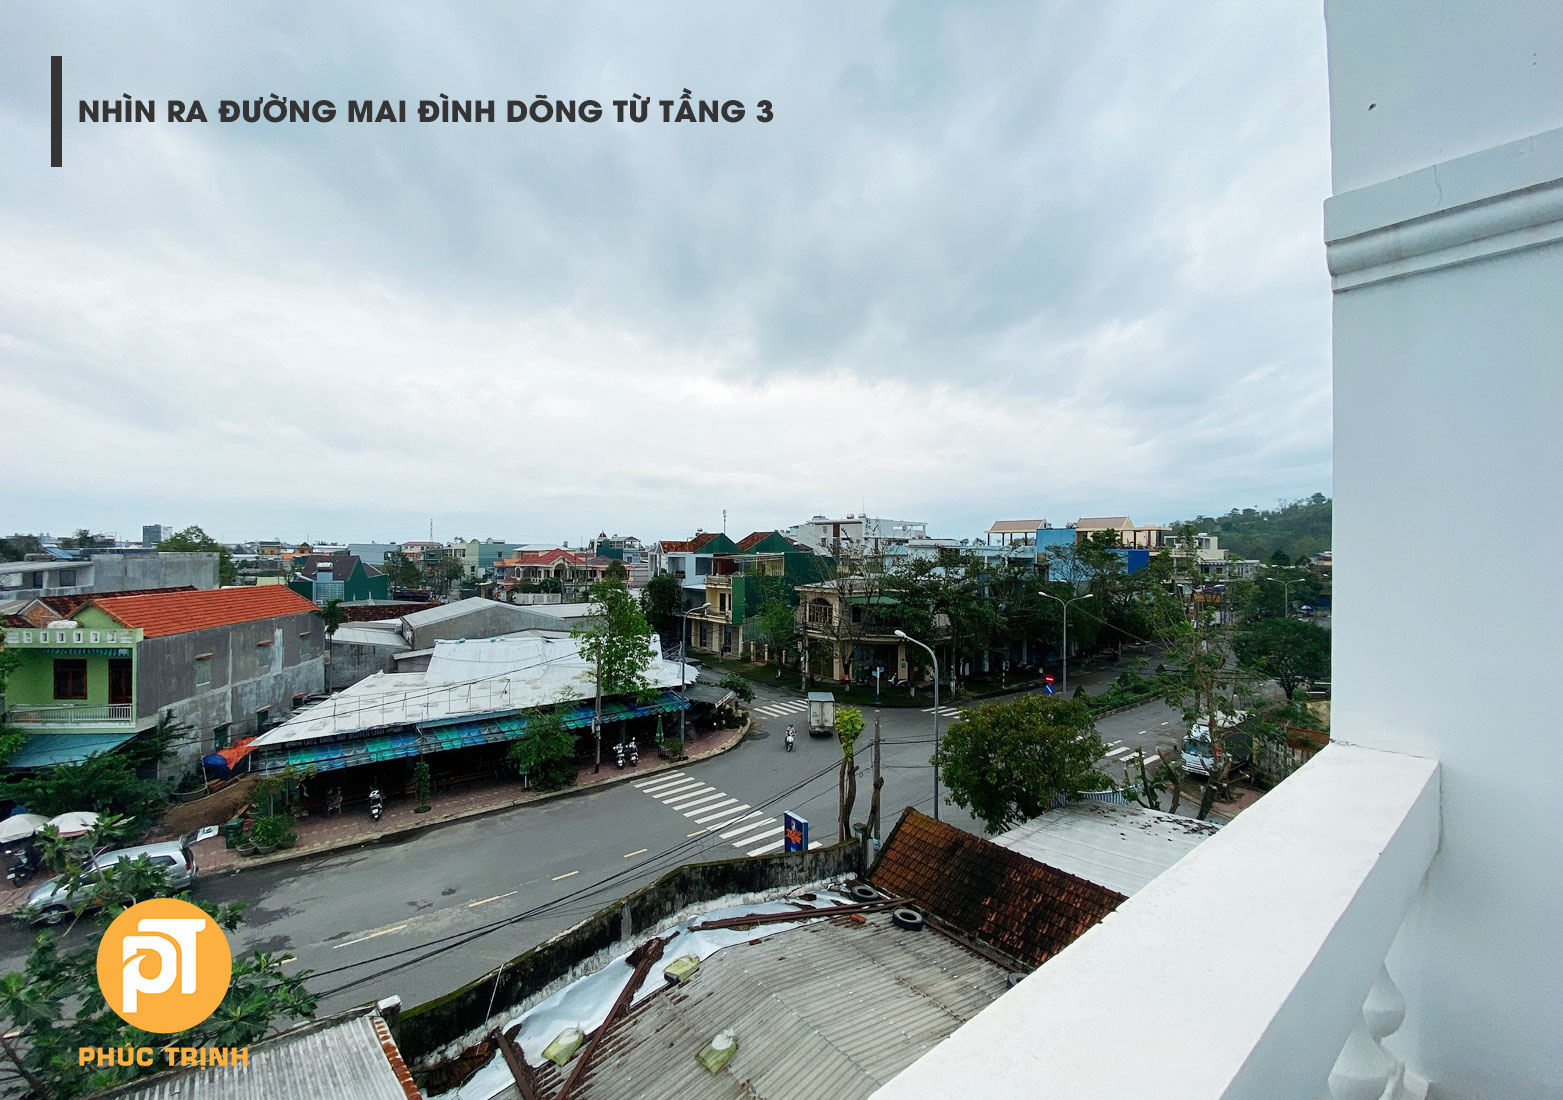 nhin-ra-duong-mai-dinh-dong-tu-tang-3-shophouse-vincom-quang-ngai